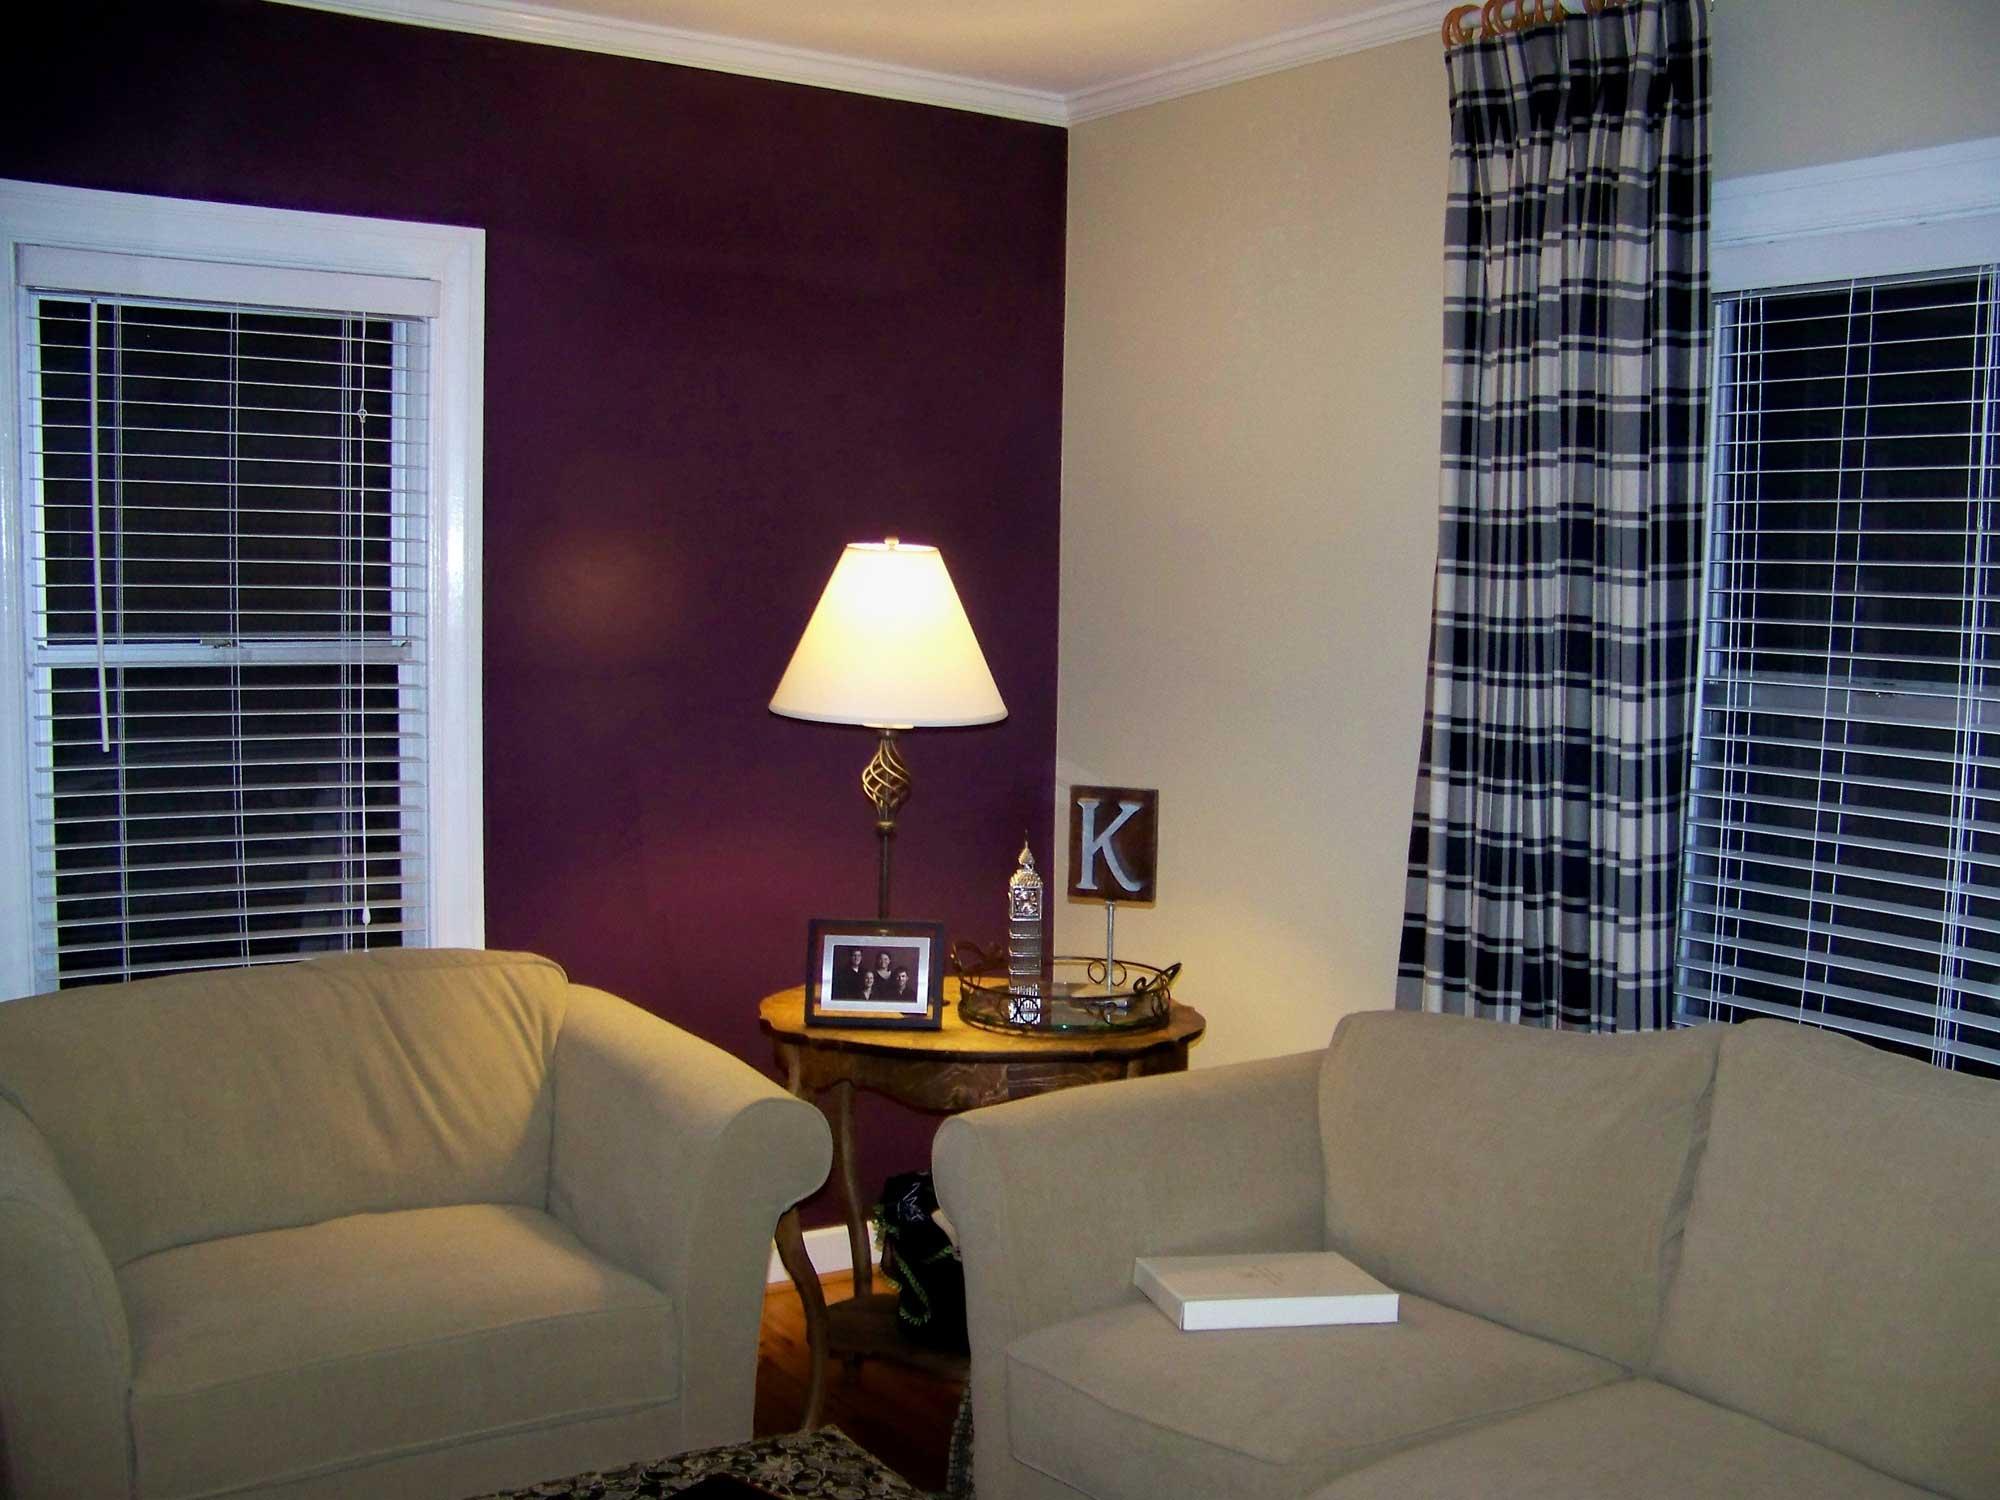 Gabungan warna ungu dan krim lembut serta sofa kelabu untuk ruang tamu nampak lebih gah